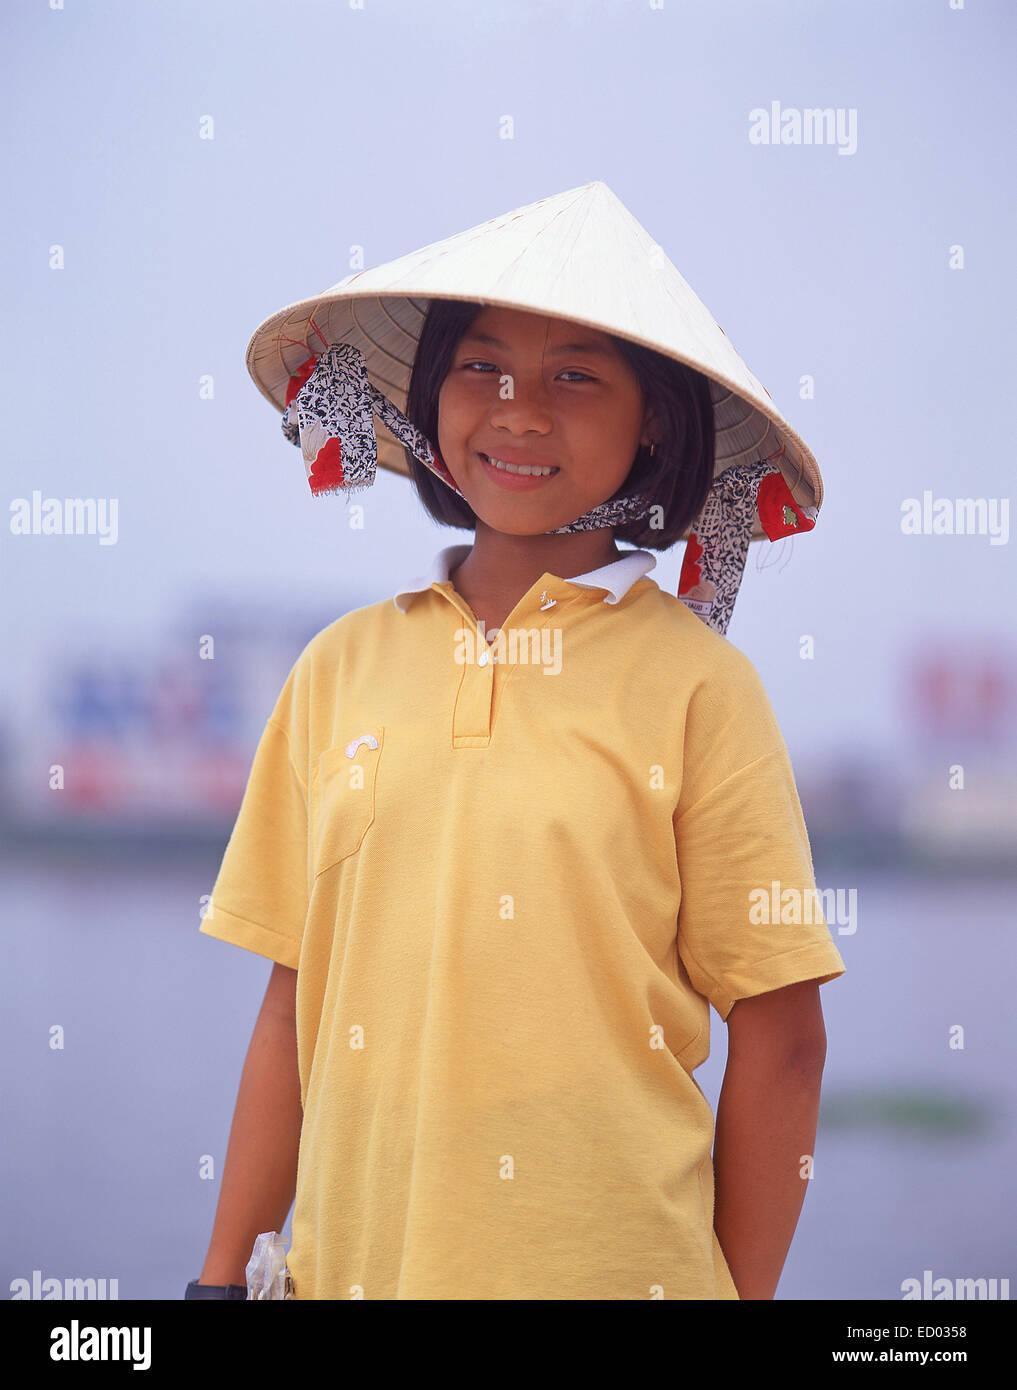 ce14be82d3c Vietnamese Conical Hats Stock Photos   Vietnamese Conical Hats Stock ...